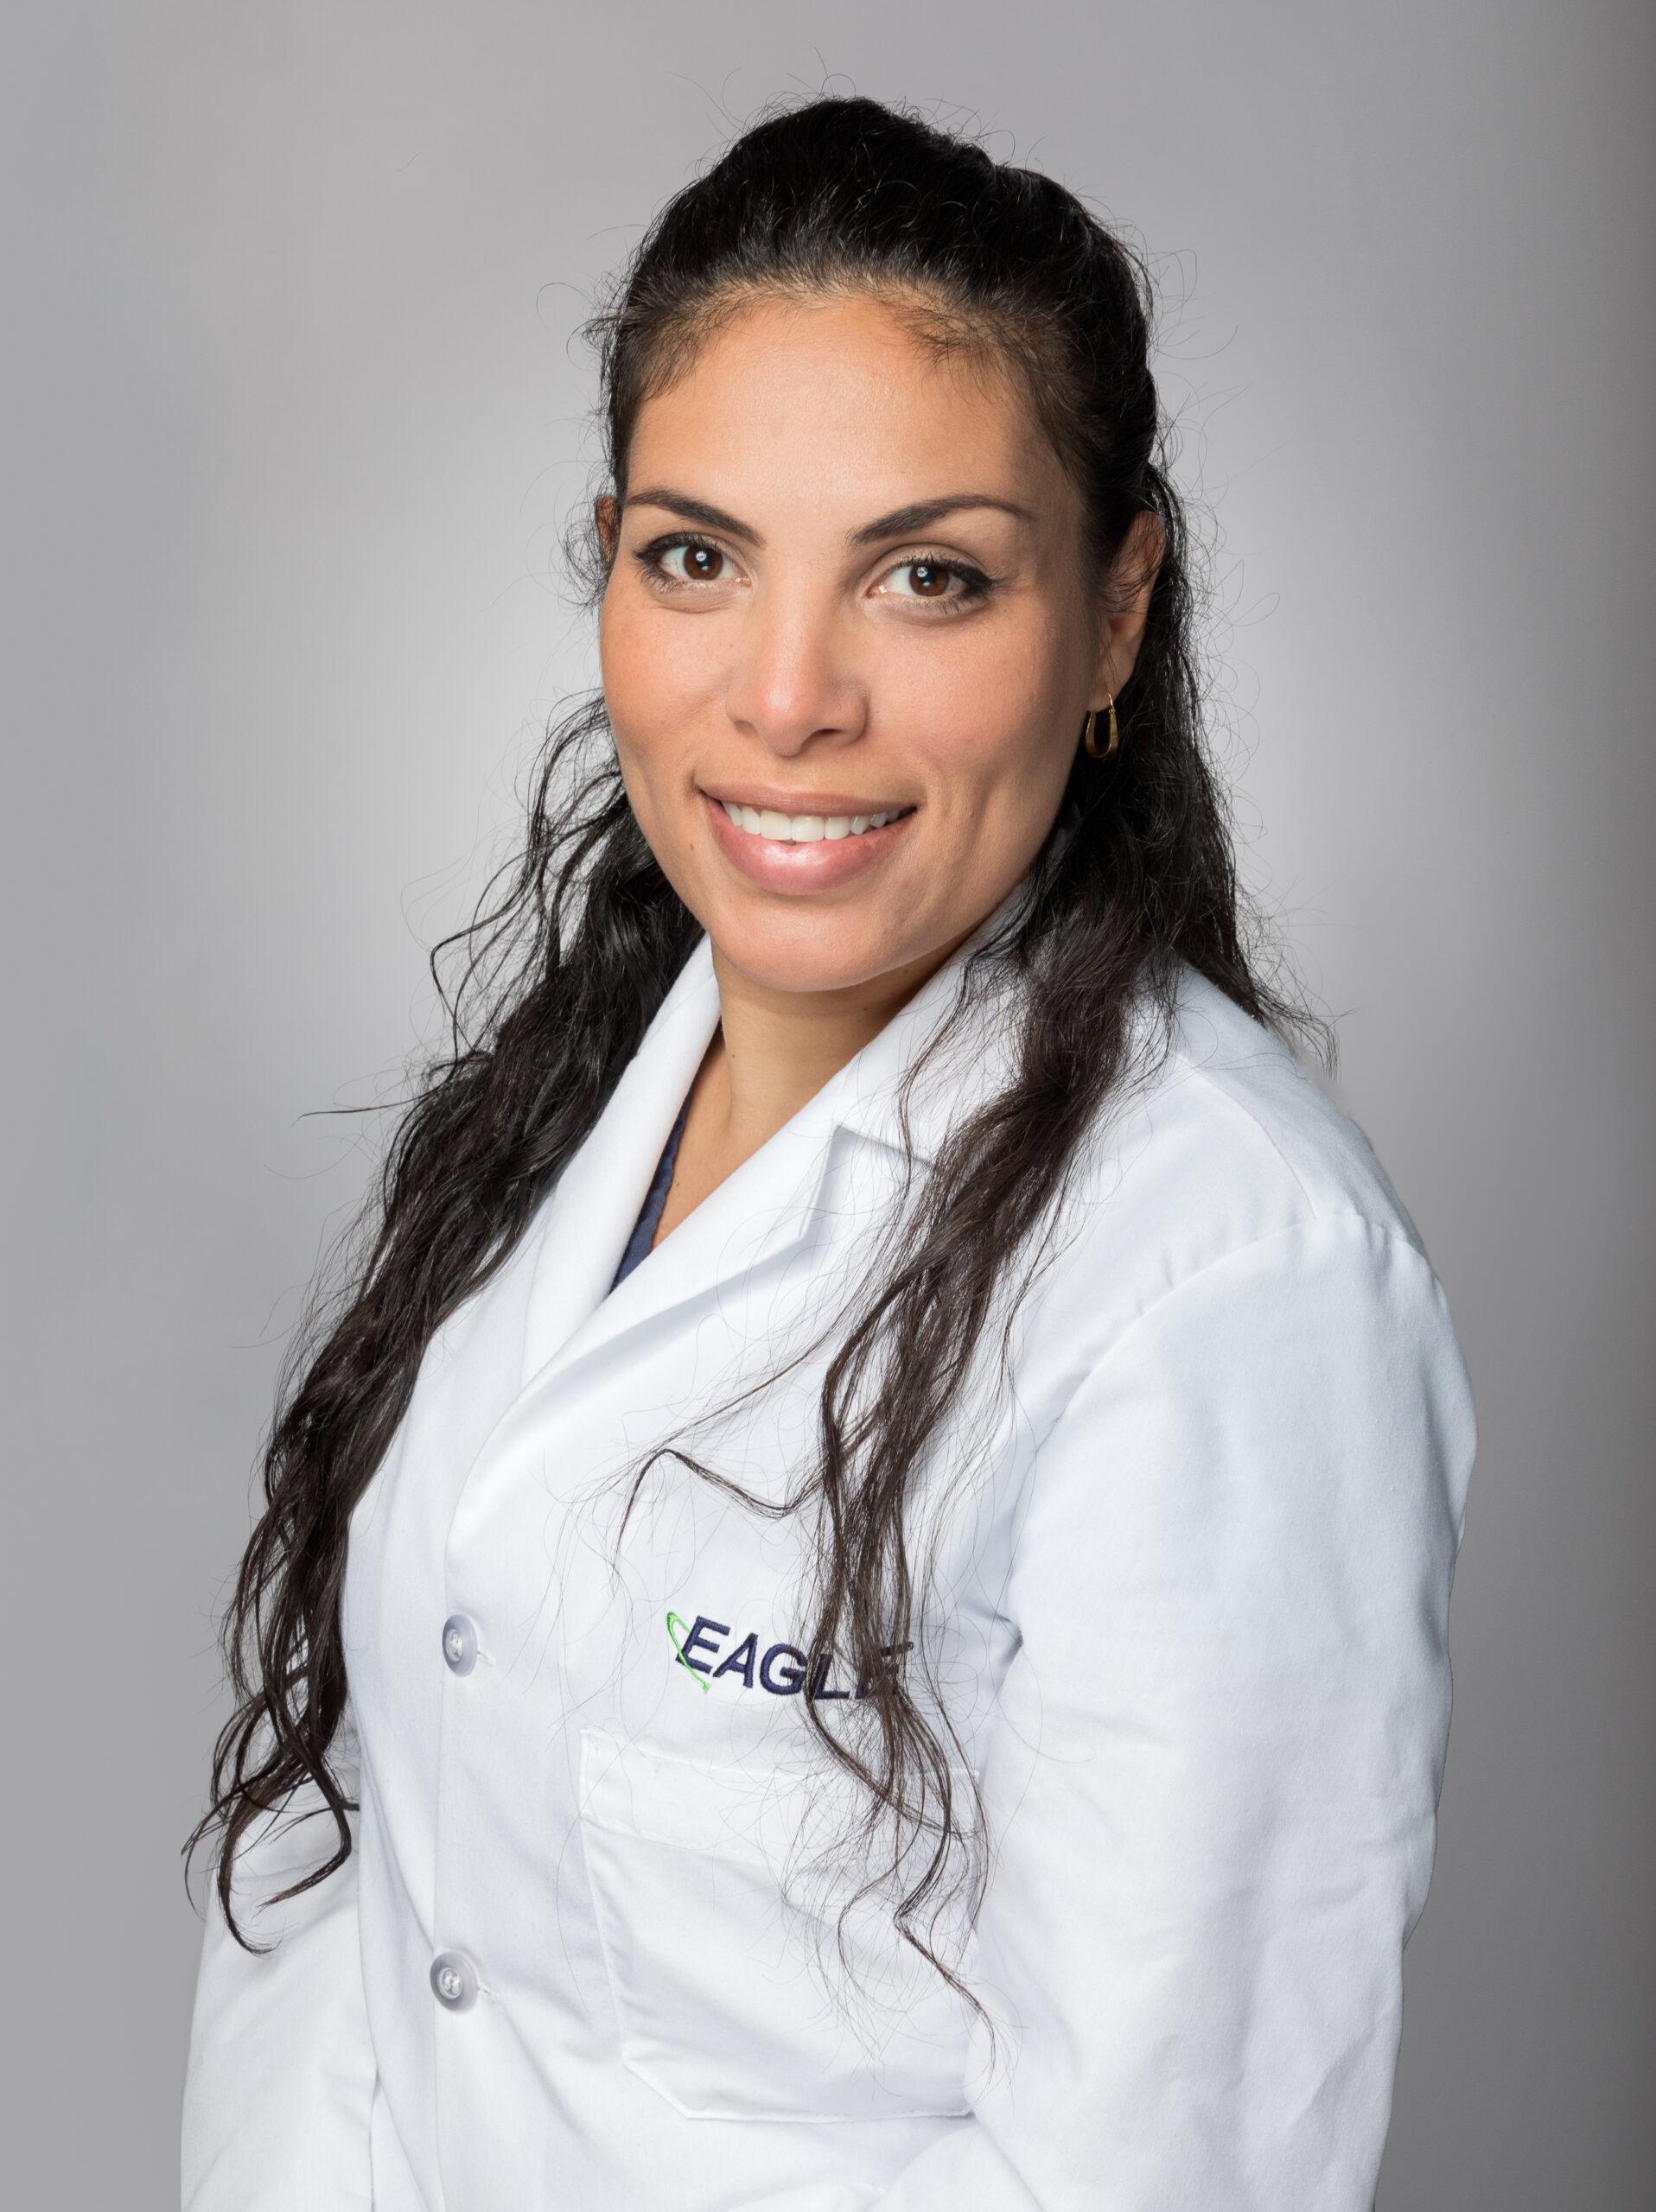 Chemist Supervisor Margaret Pereira smiles while wearing an Eagle lab coat.